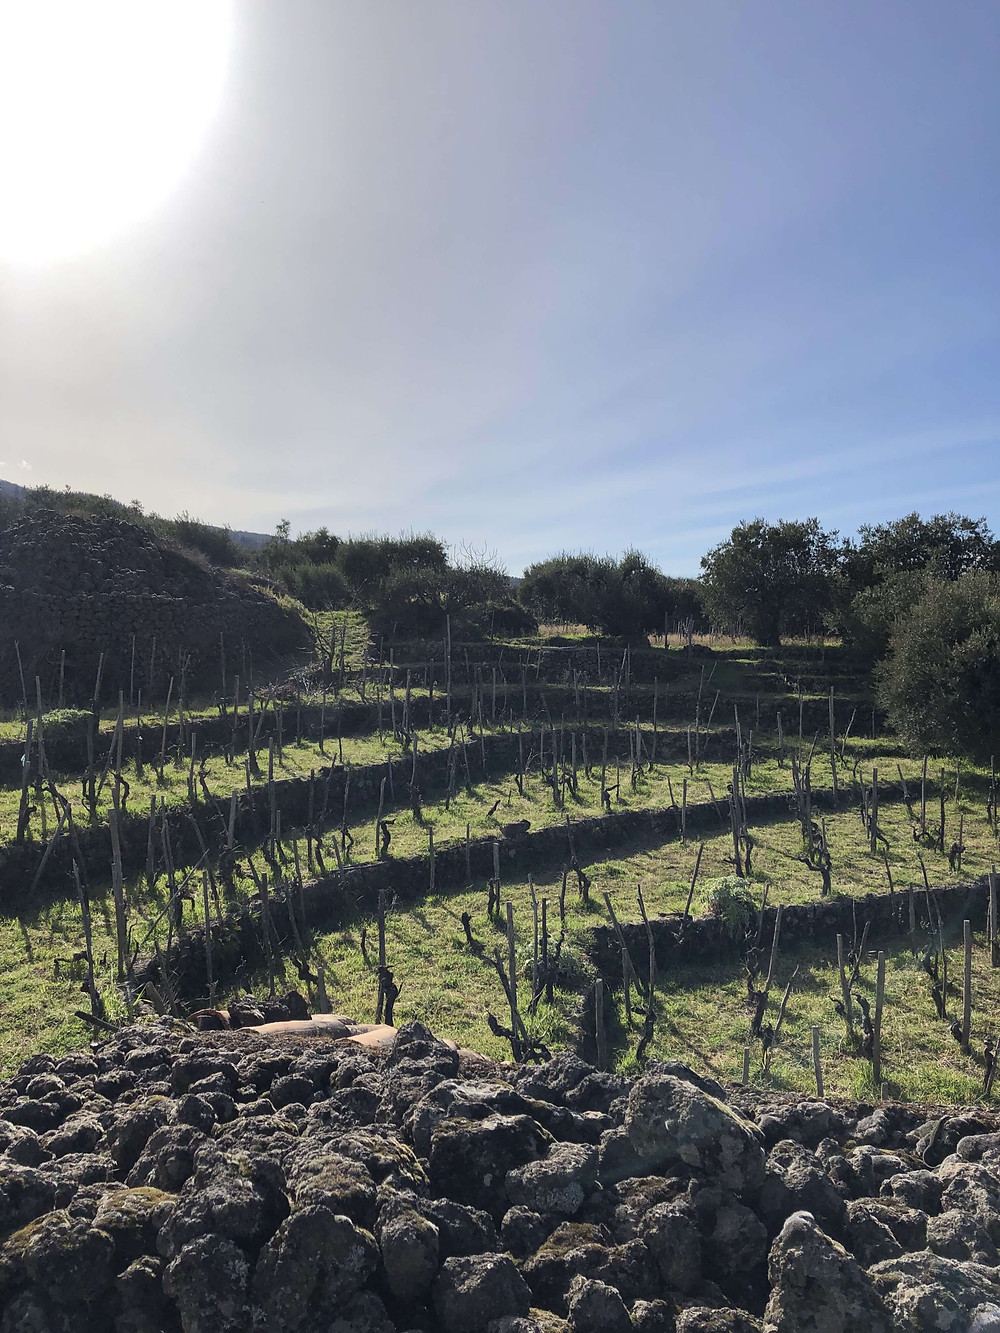 amphitheater shaped traditional vineyard in Etna wine region with alberello bush trained Nerello Mascalese vine